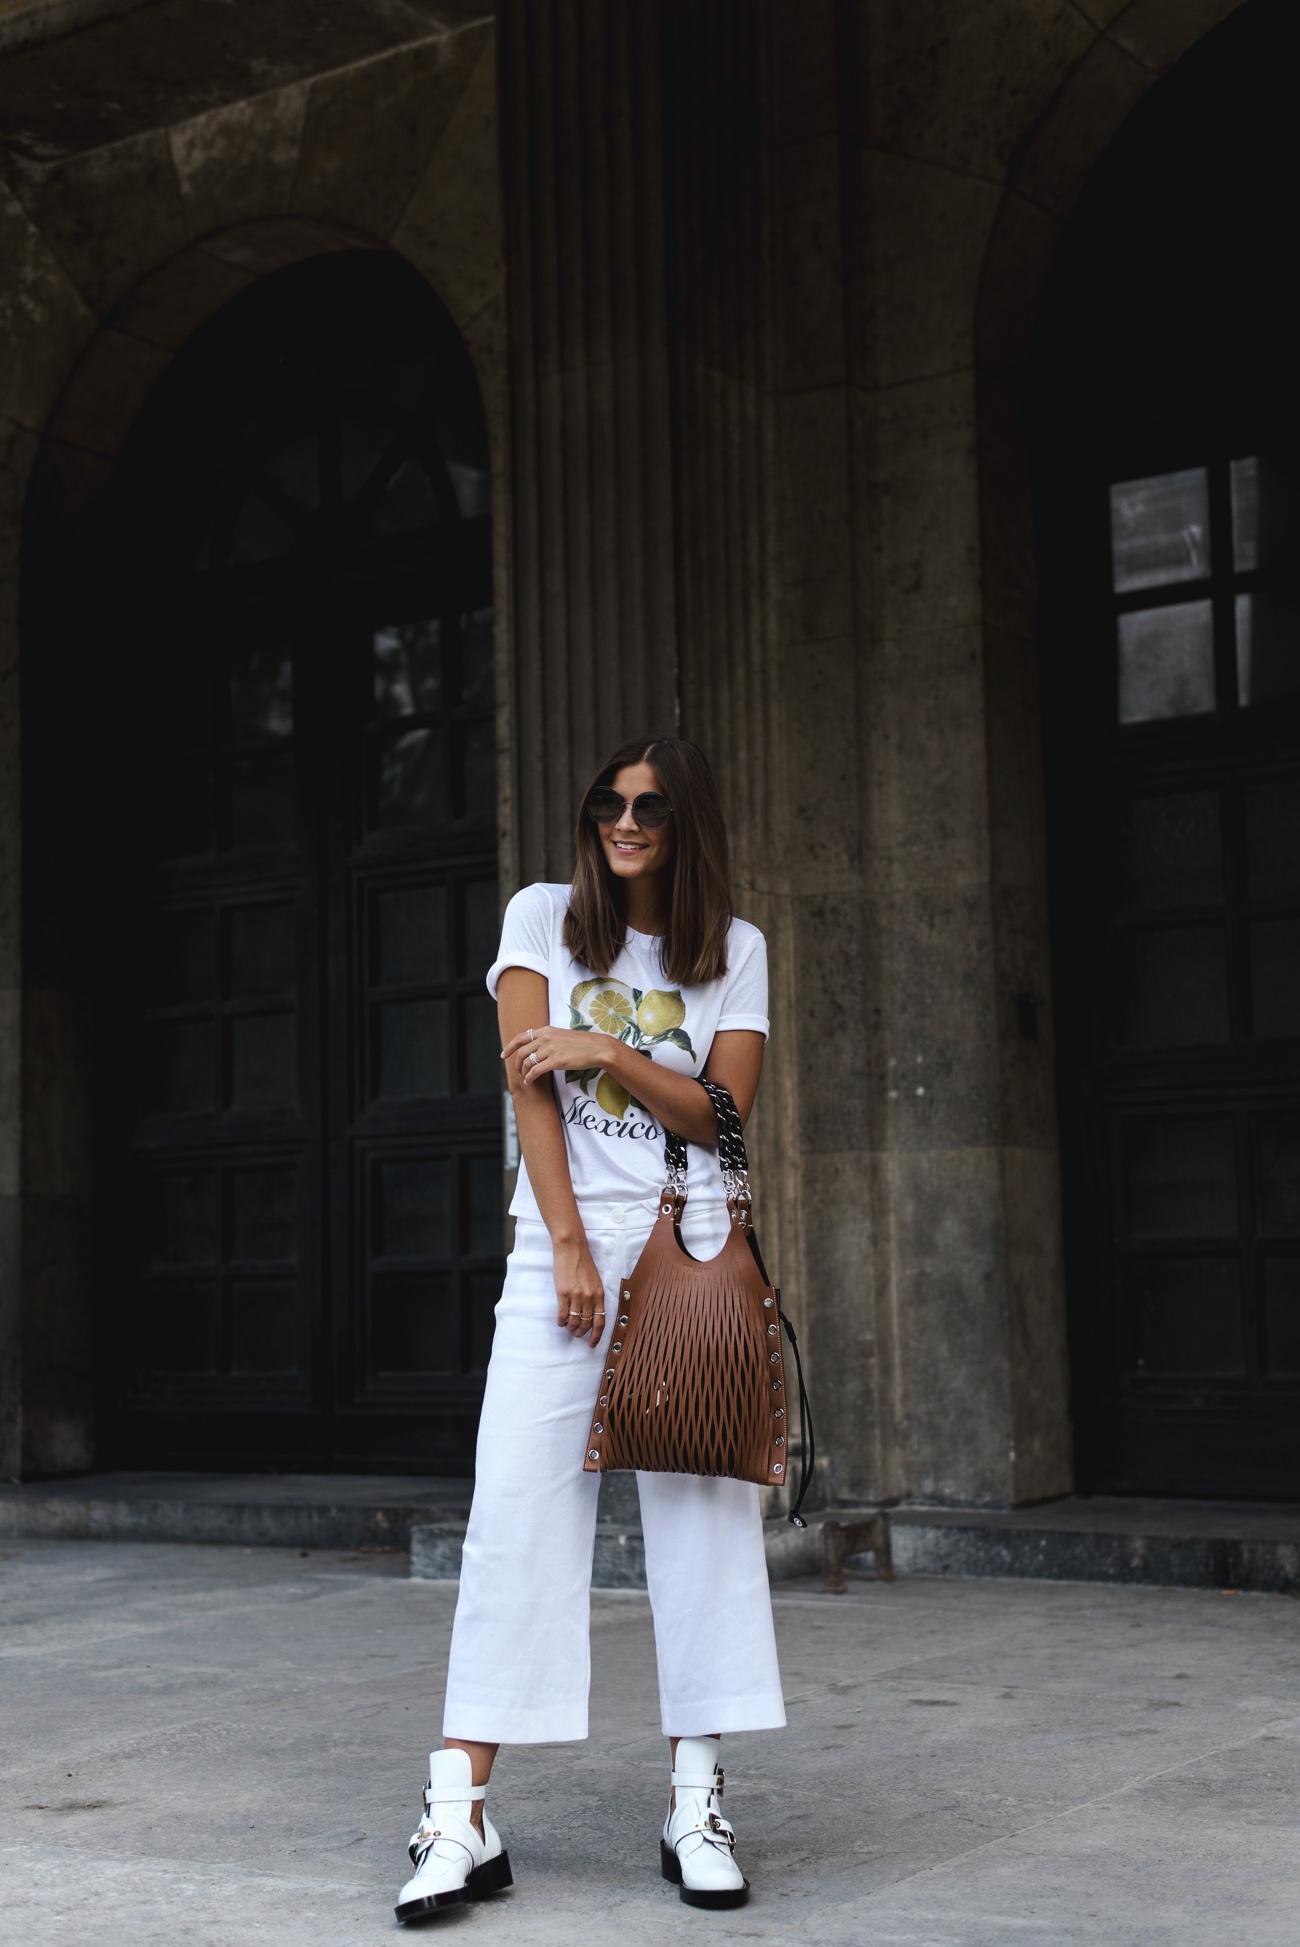 mode-trends-2017-zitronen-print-t-shirt-blogger-style-nina-schwichtenberg-fashiioncarpet